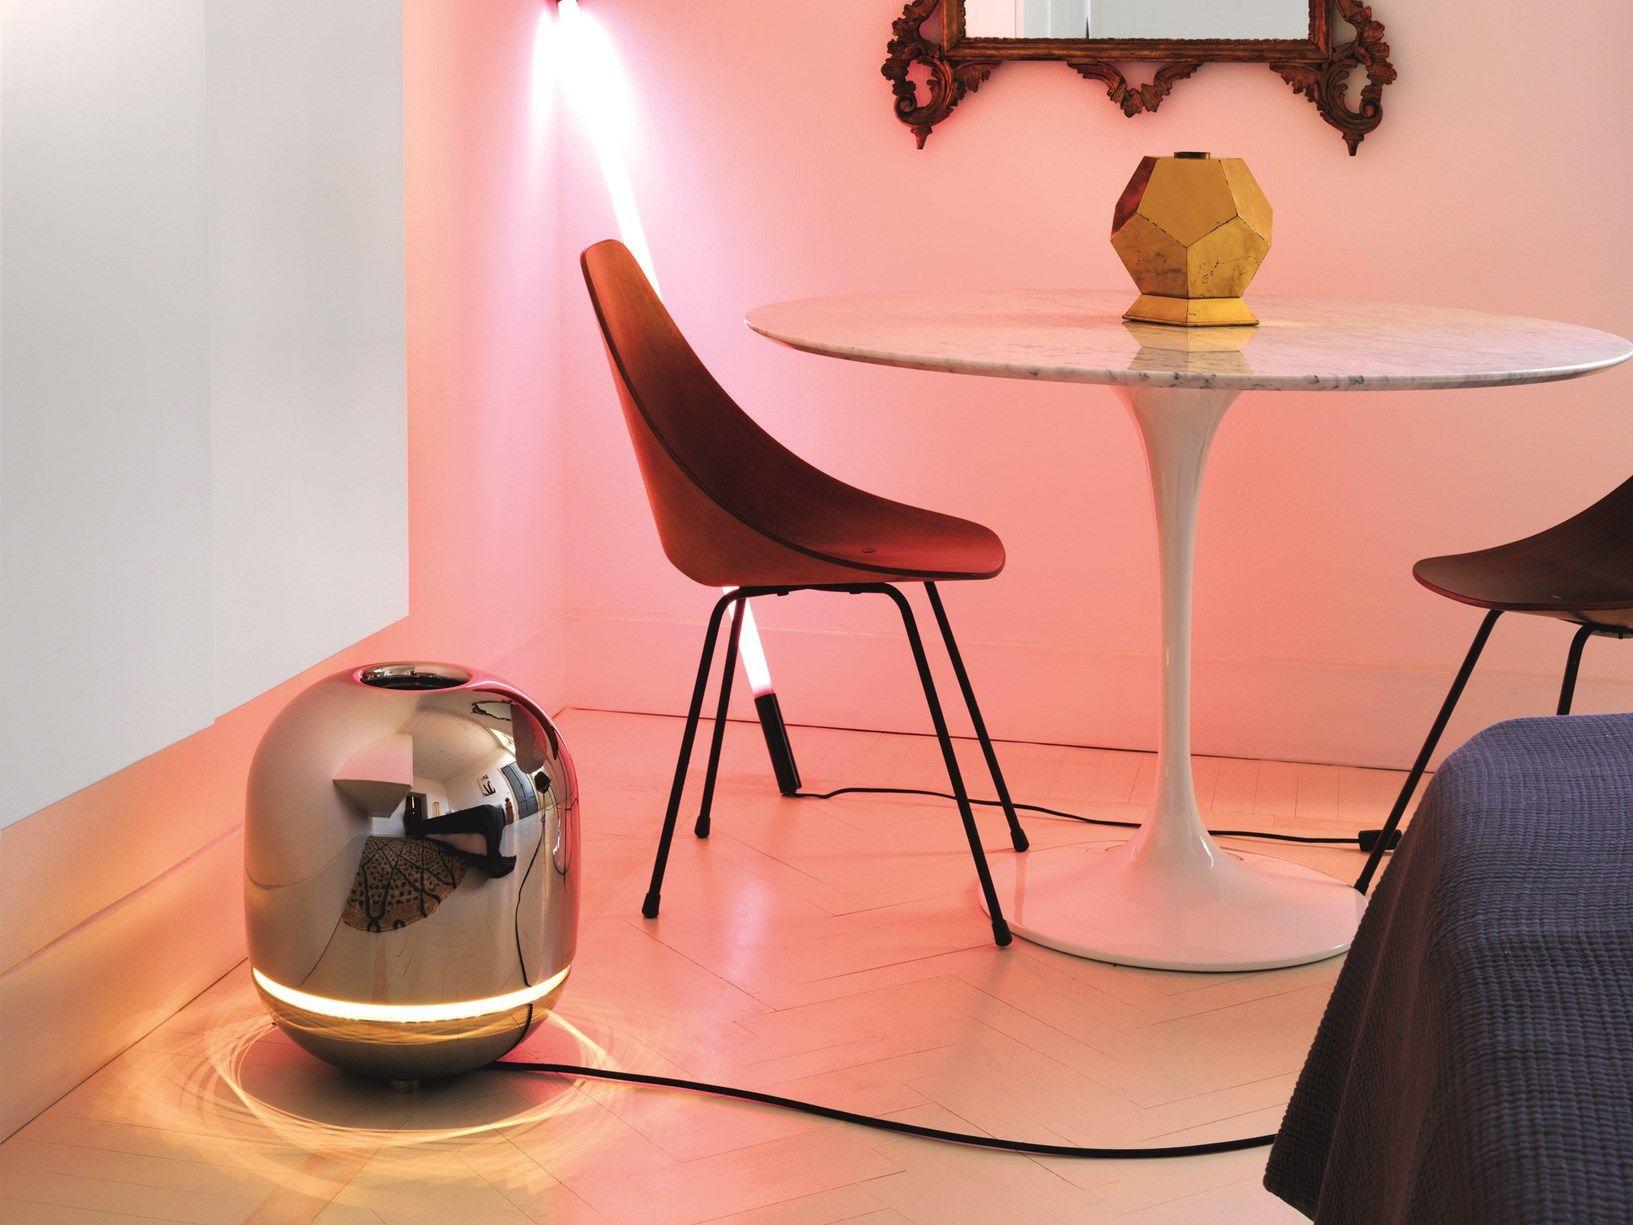 Calore + luce. Ludovica + Roberto Palomba per Tubes